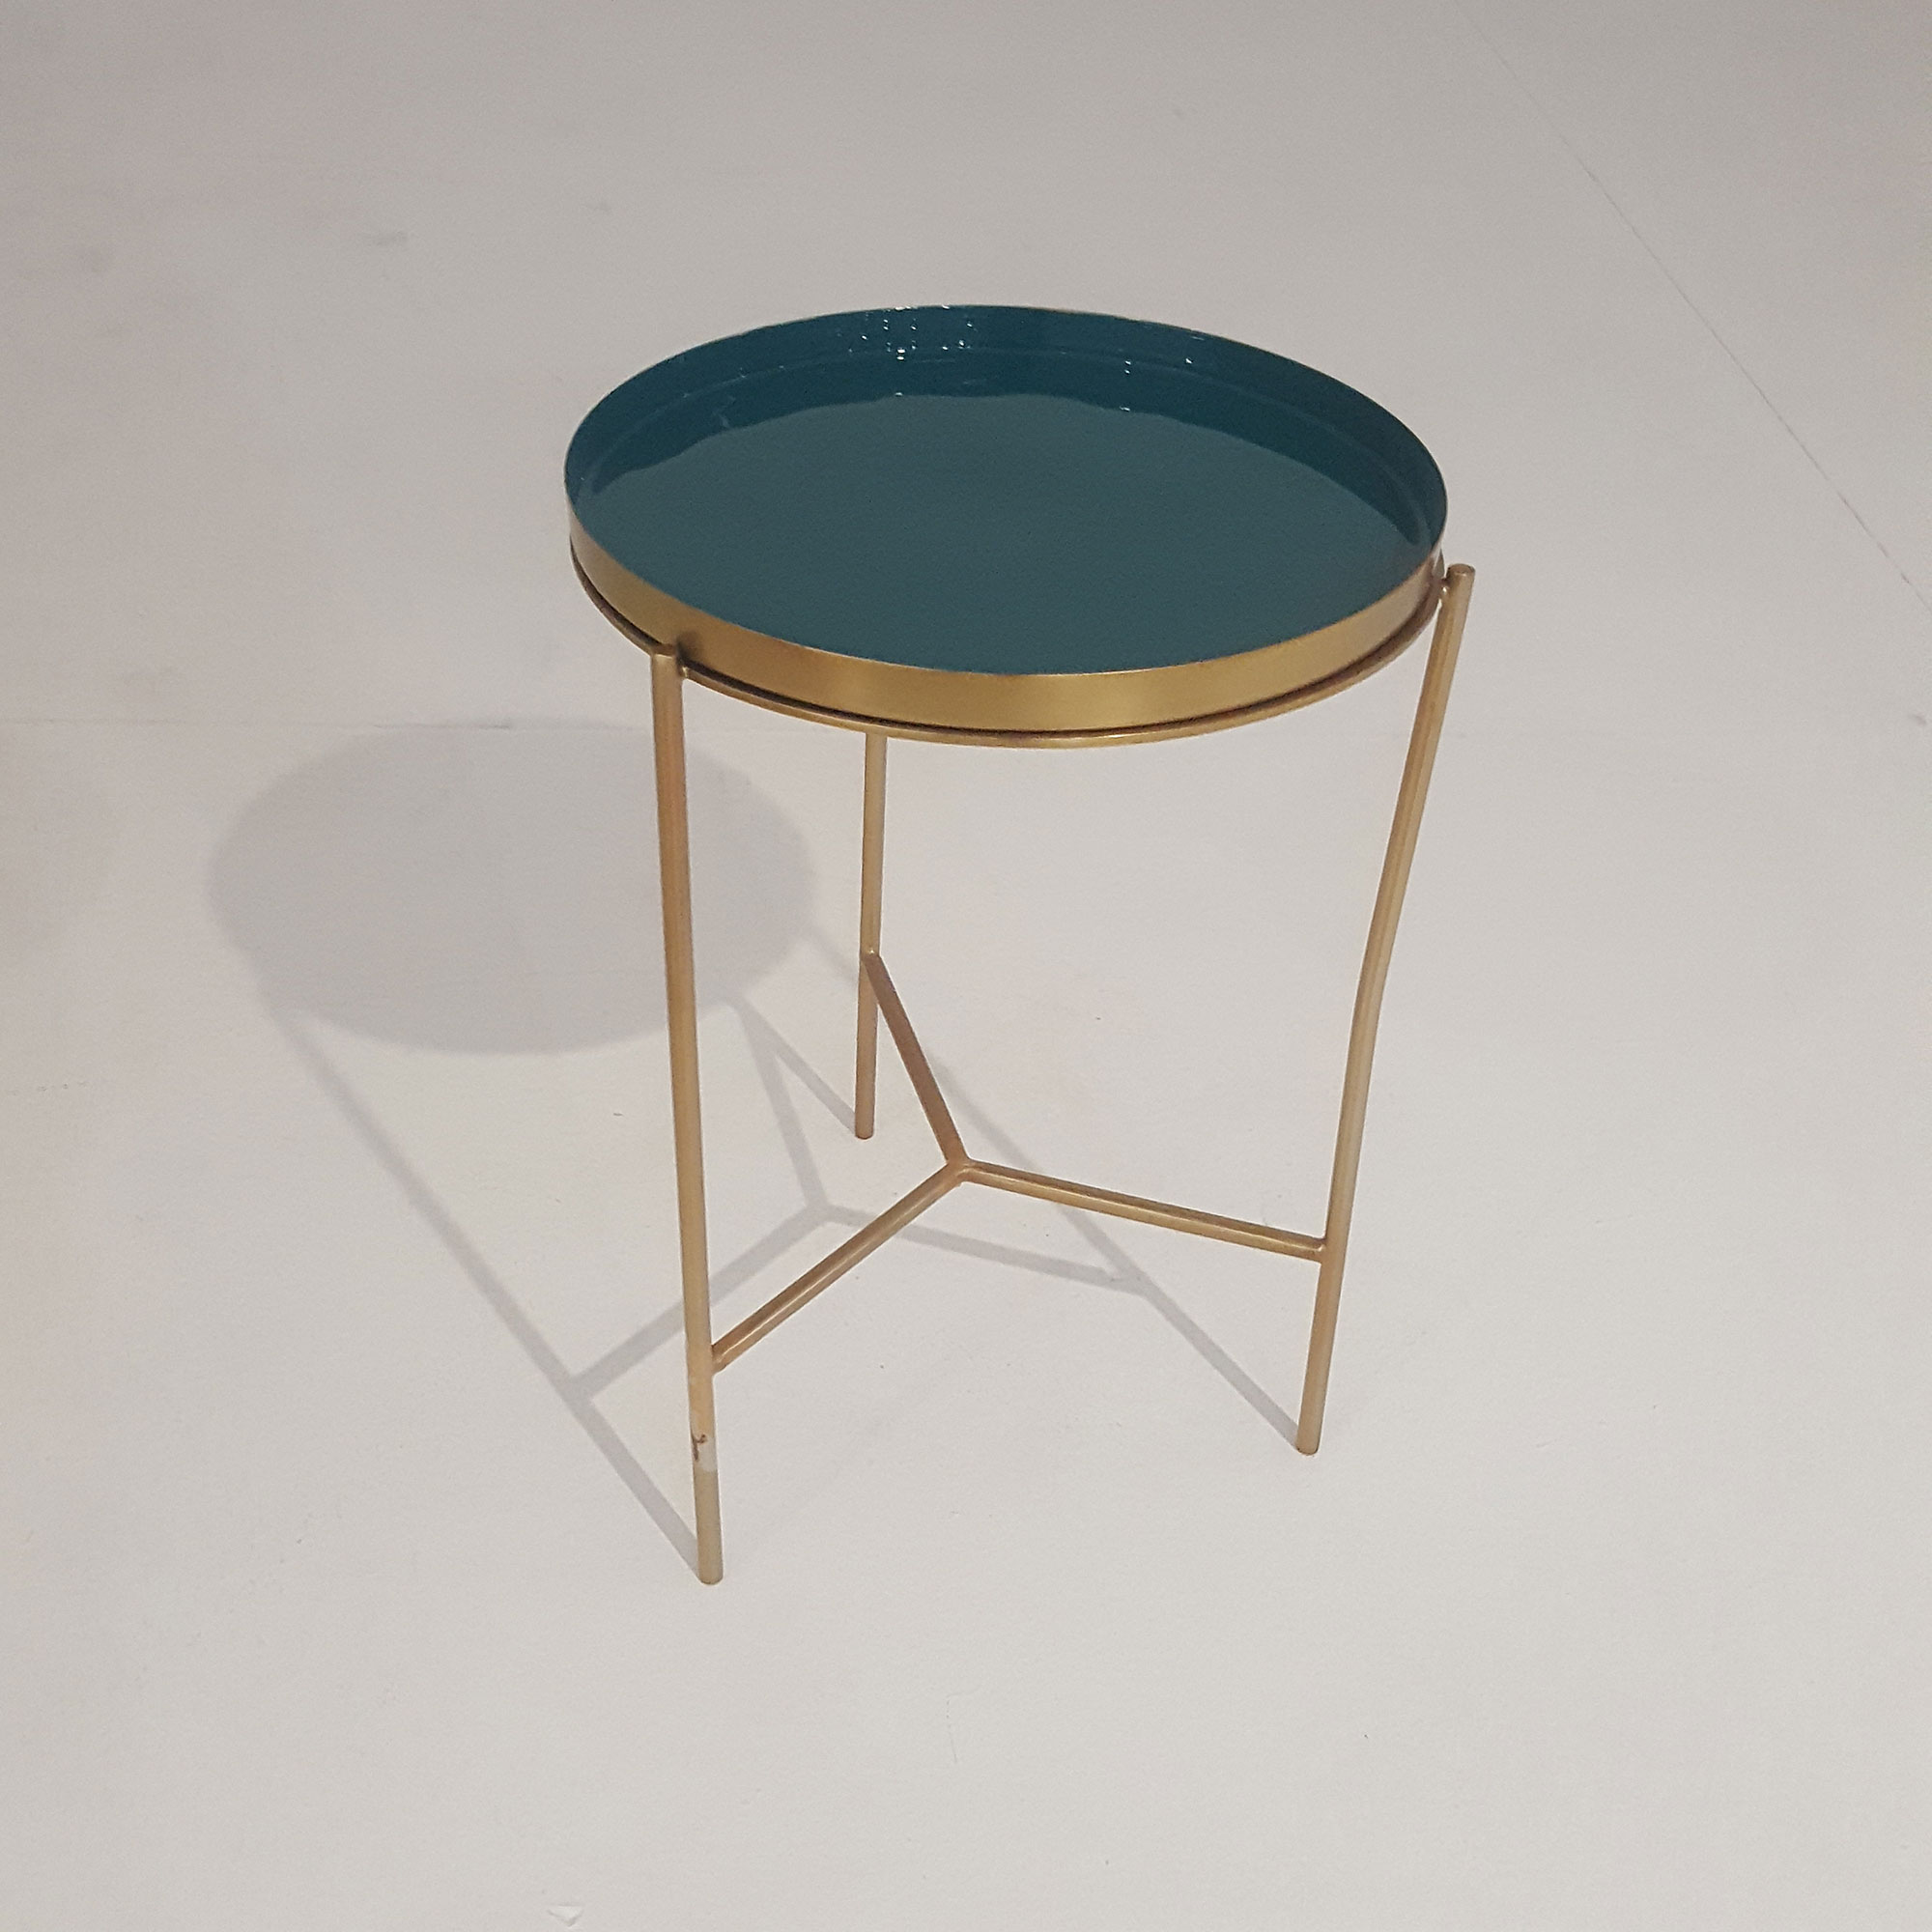 Laforma naoko bakkebord - grøn/messing emalje/metal, rund (ø31) fra laforma på boboonline.dk